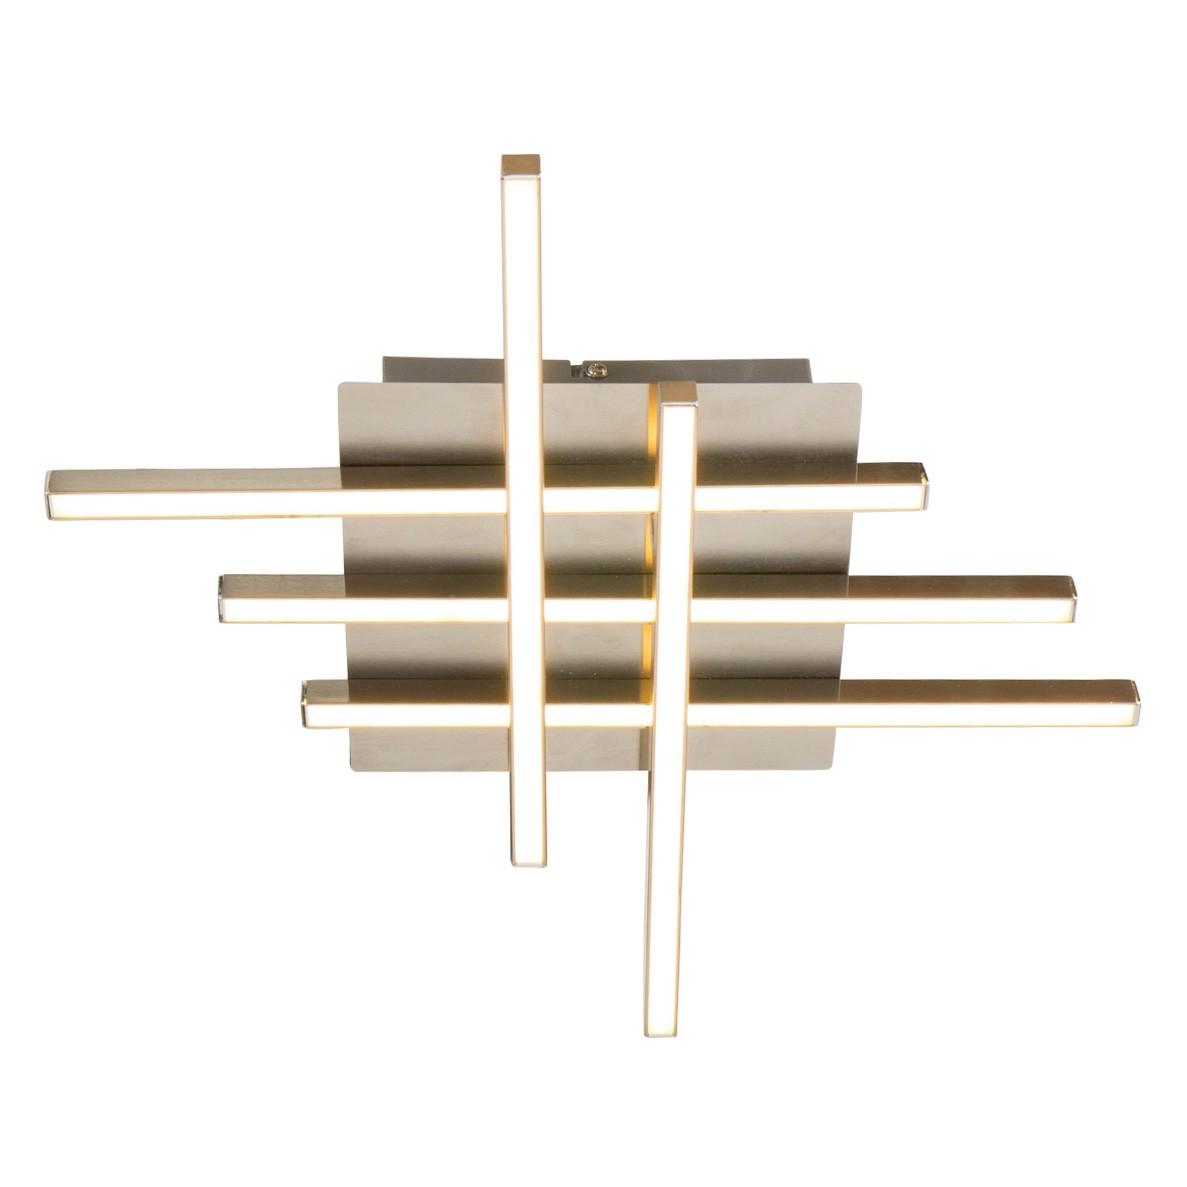 LED-Deckenleuchte Ceiling Aluminium Silber ● 5-flammig- Steinhauer A+